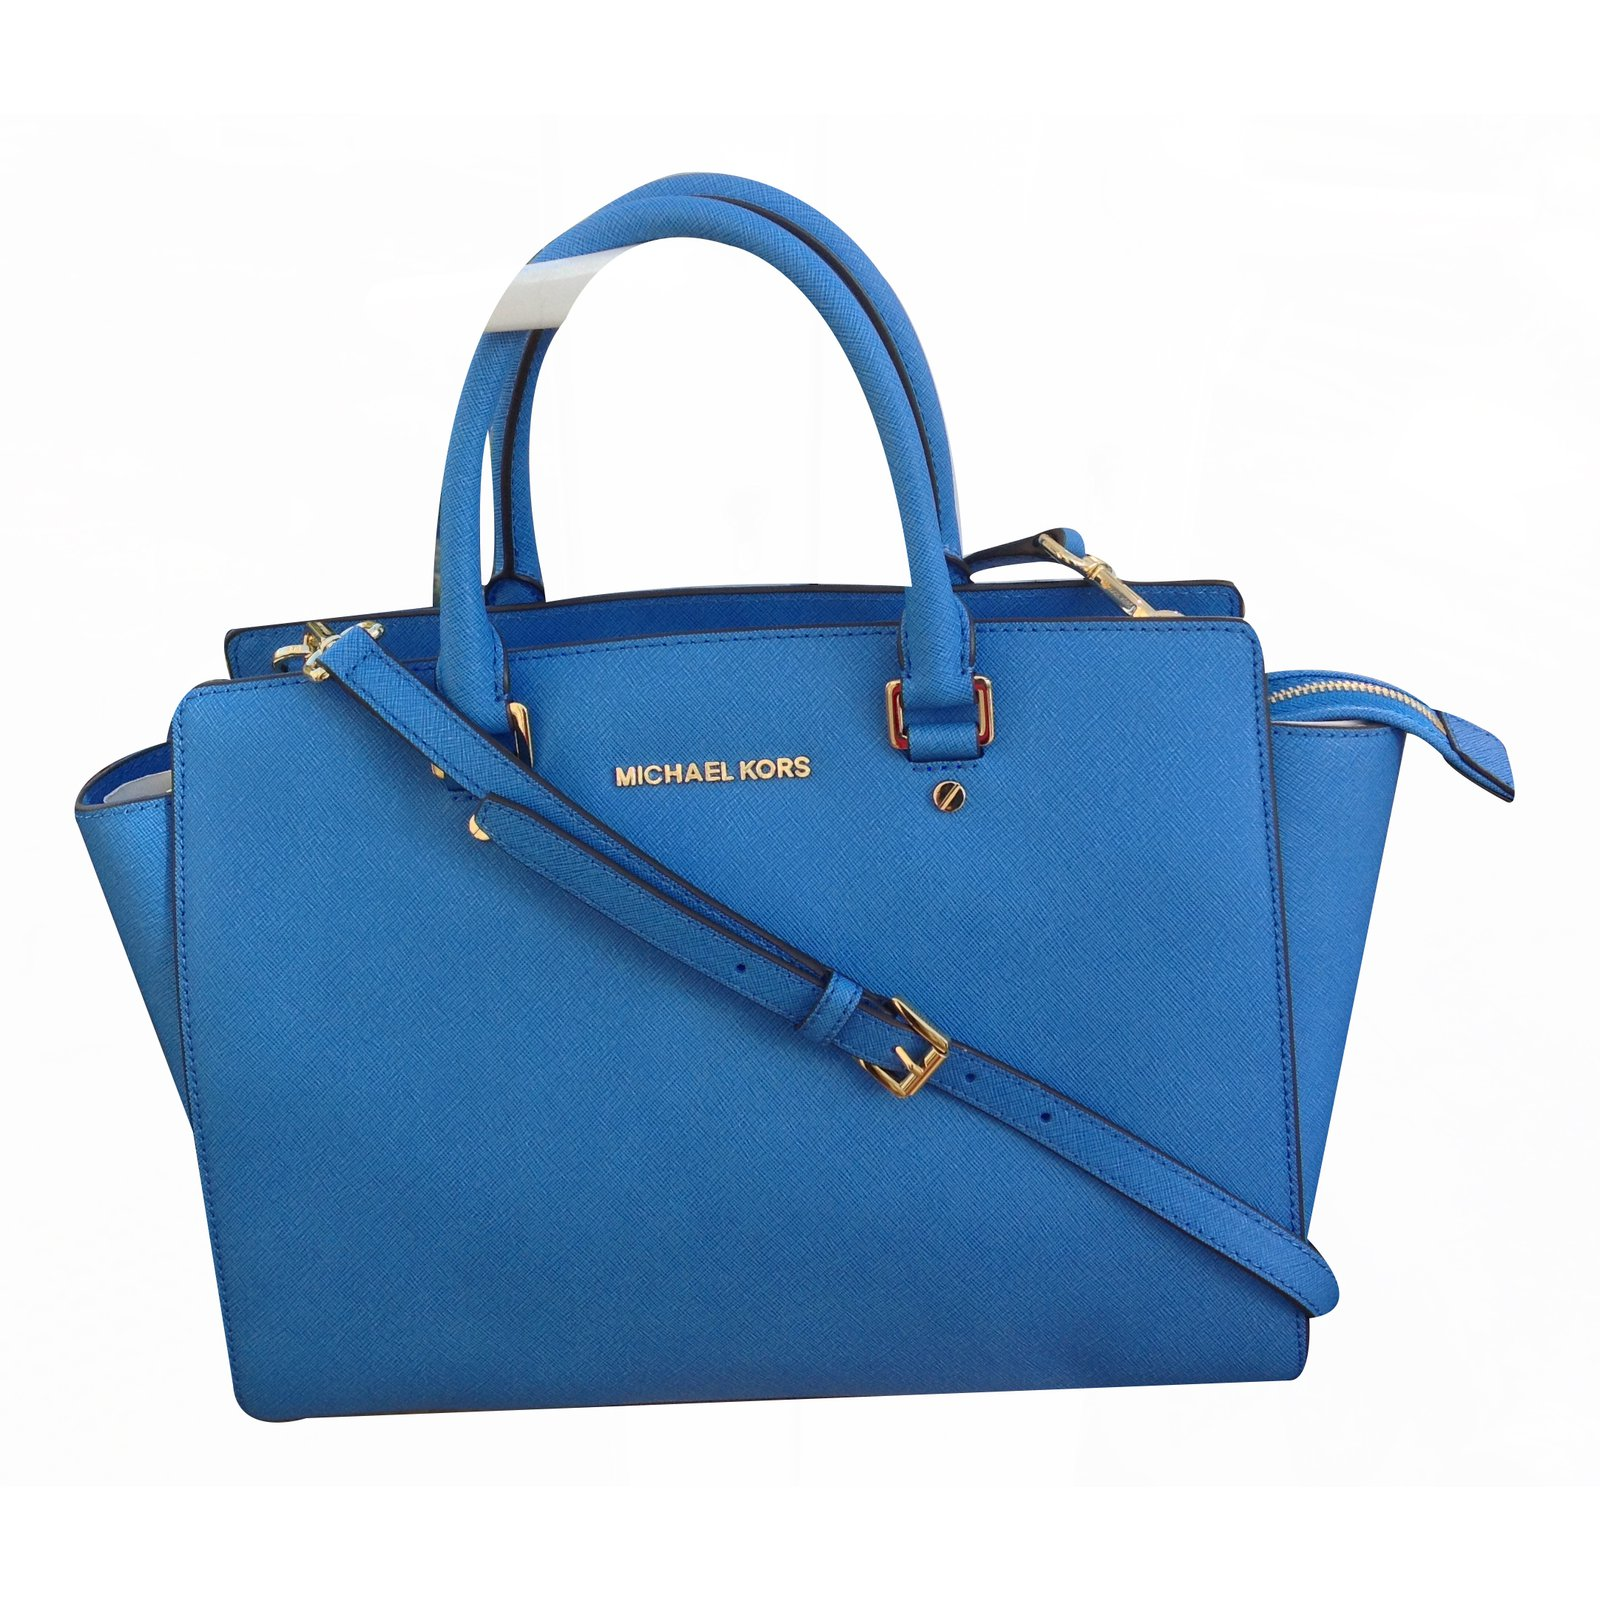 77b55dba462c0b Michael Kors Selma Large Tz Satchel In Heritage Blue Tote Bag Handbags  Leather Blue ref.